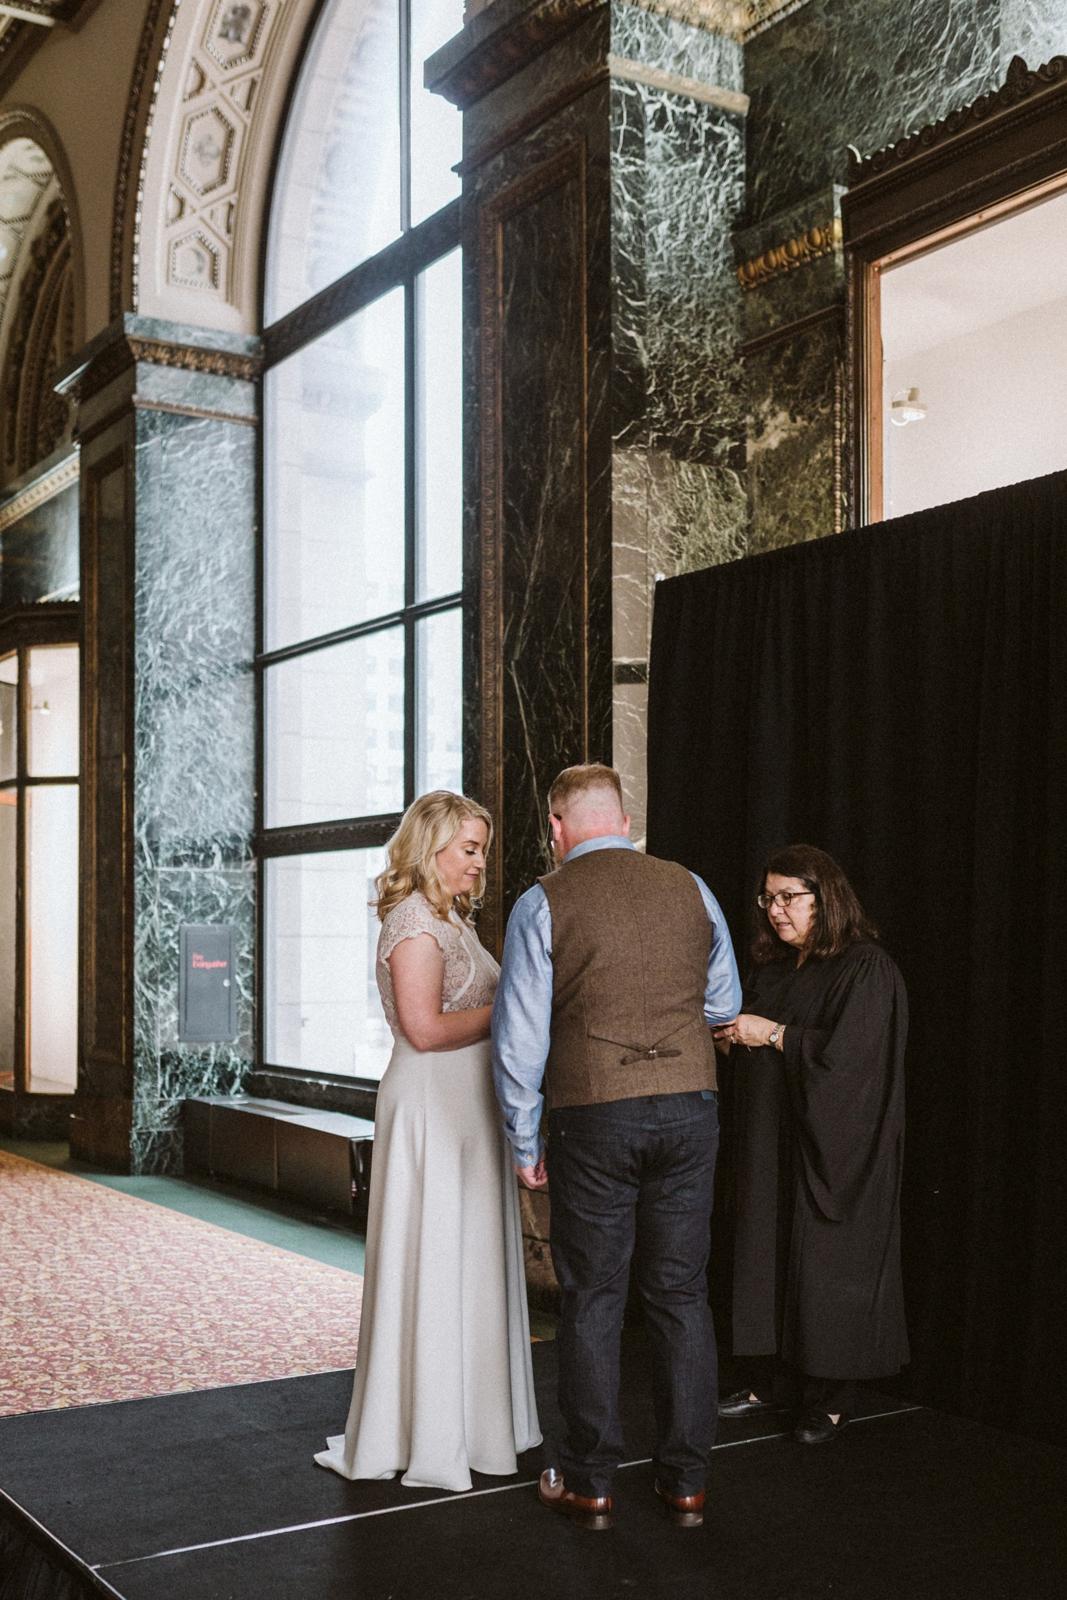 Chicago Cultural Center weddings   tiny weddings   lisa kathan photography